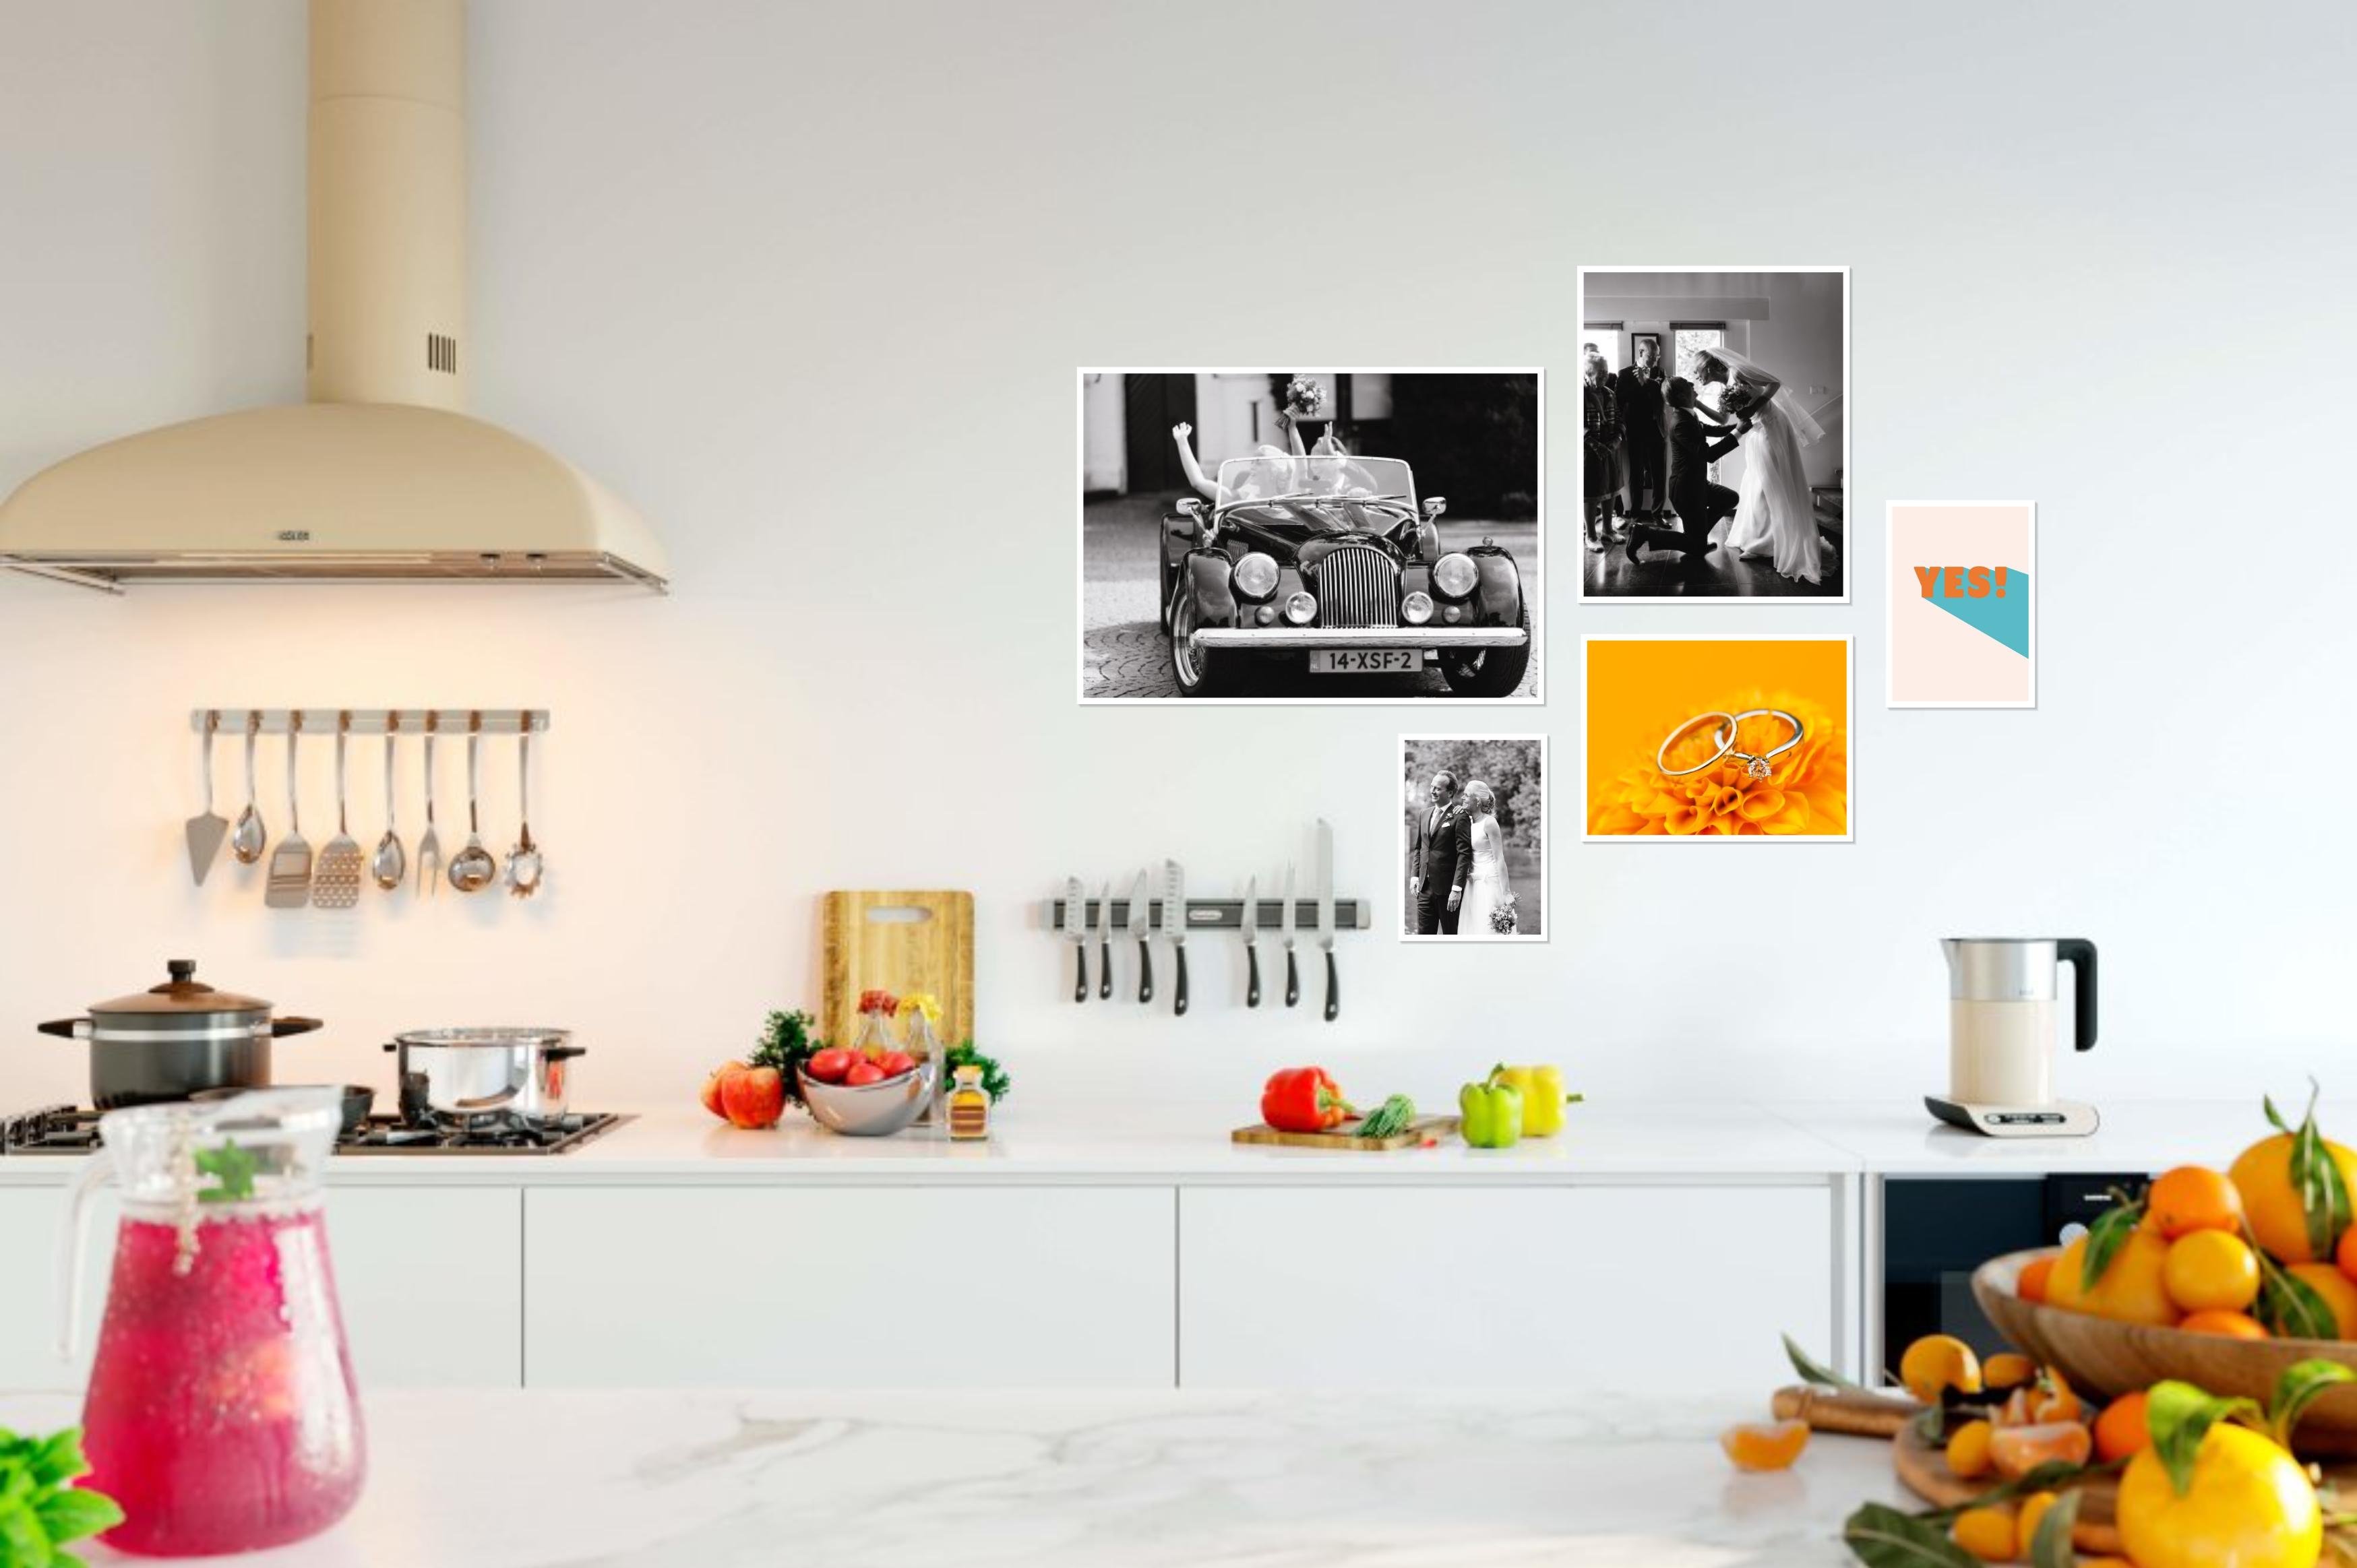 keuken muur installatie portret canvas